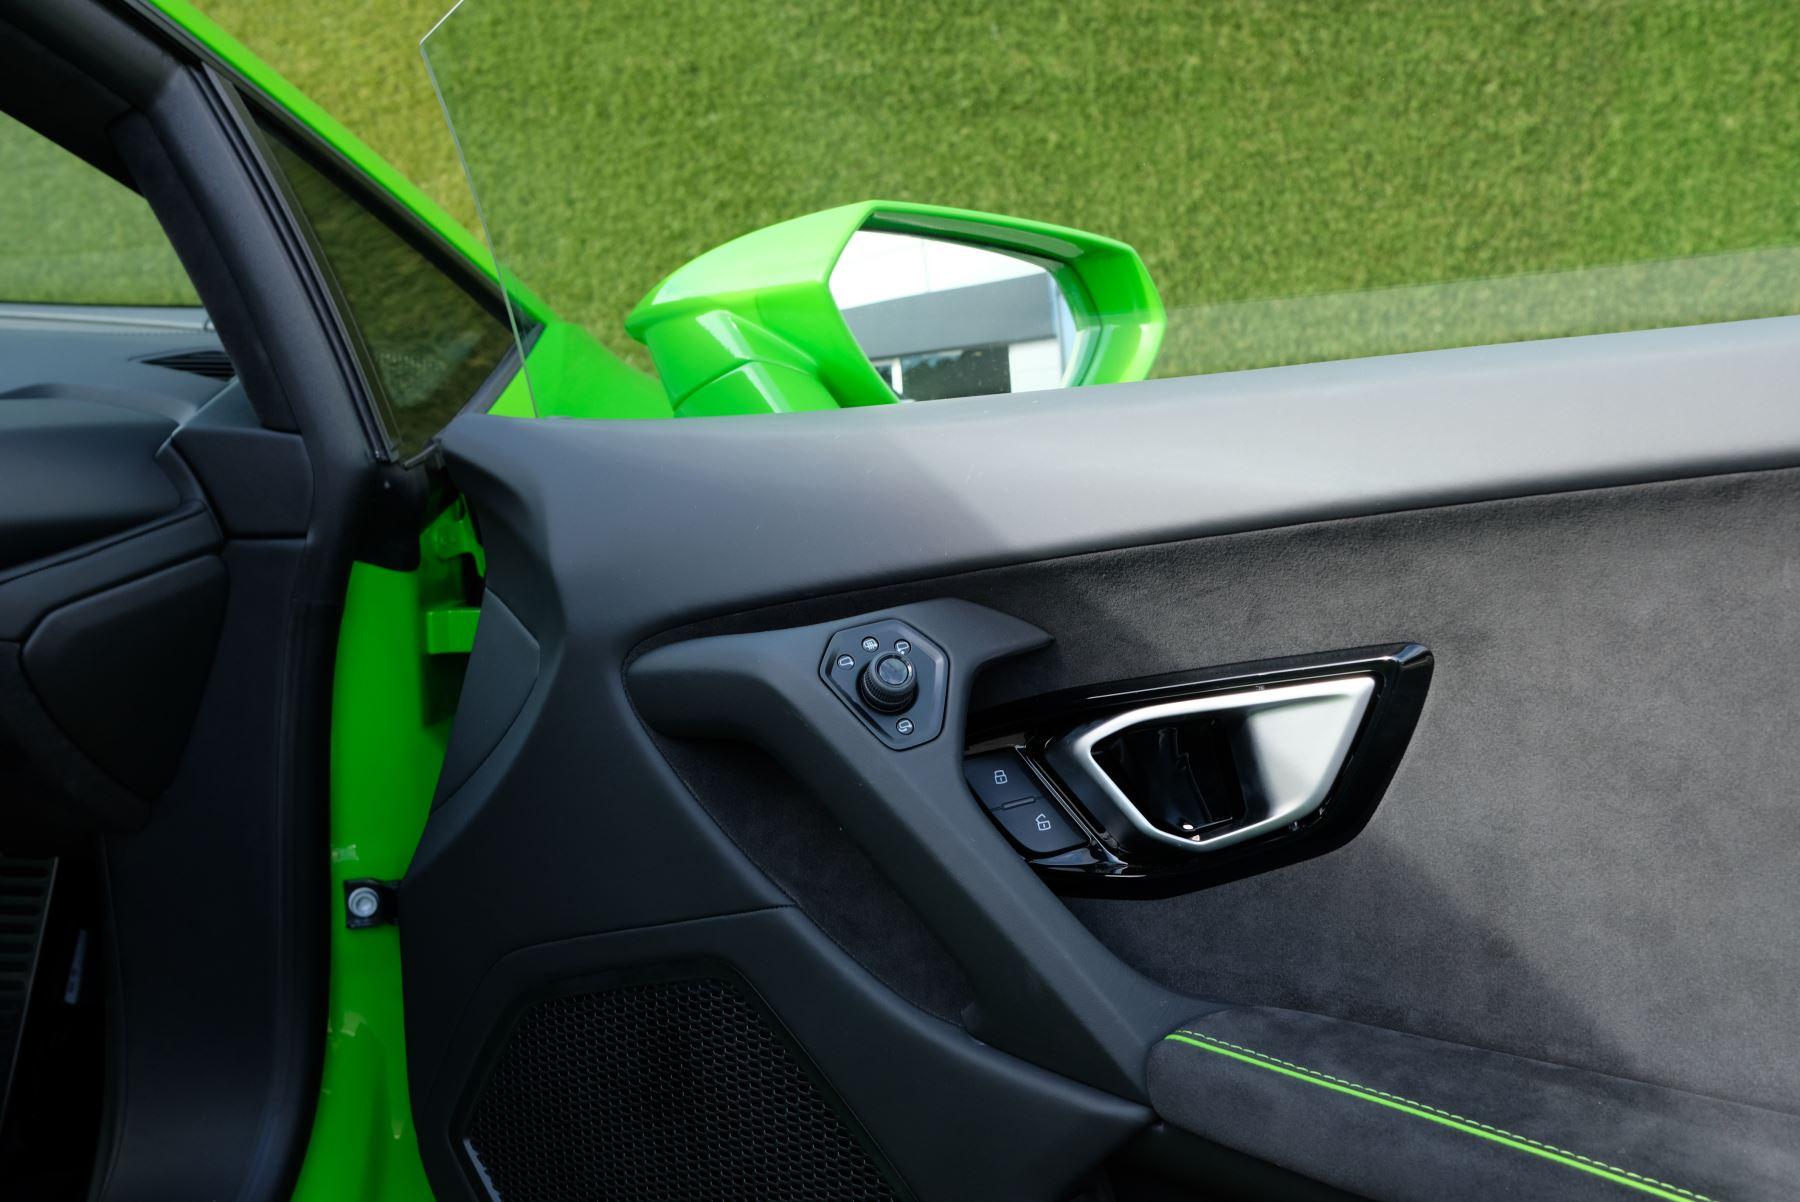 Lamborghini Huracan EVO 5.2 V10 640 2dr Auto AWD image 11